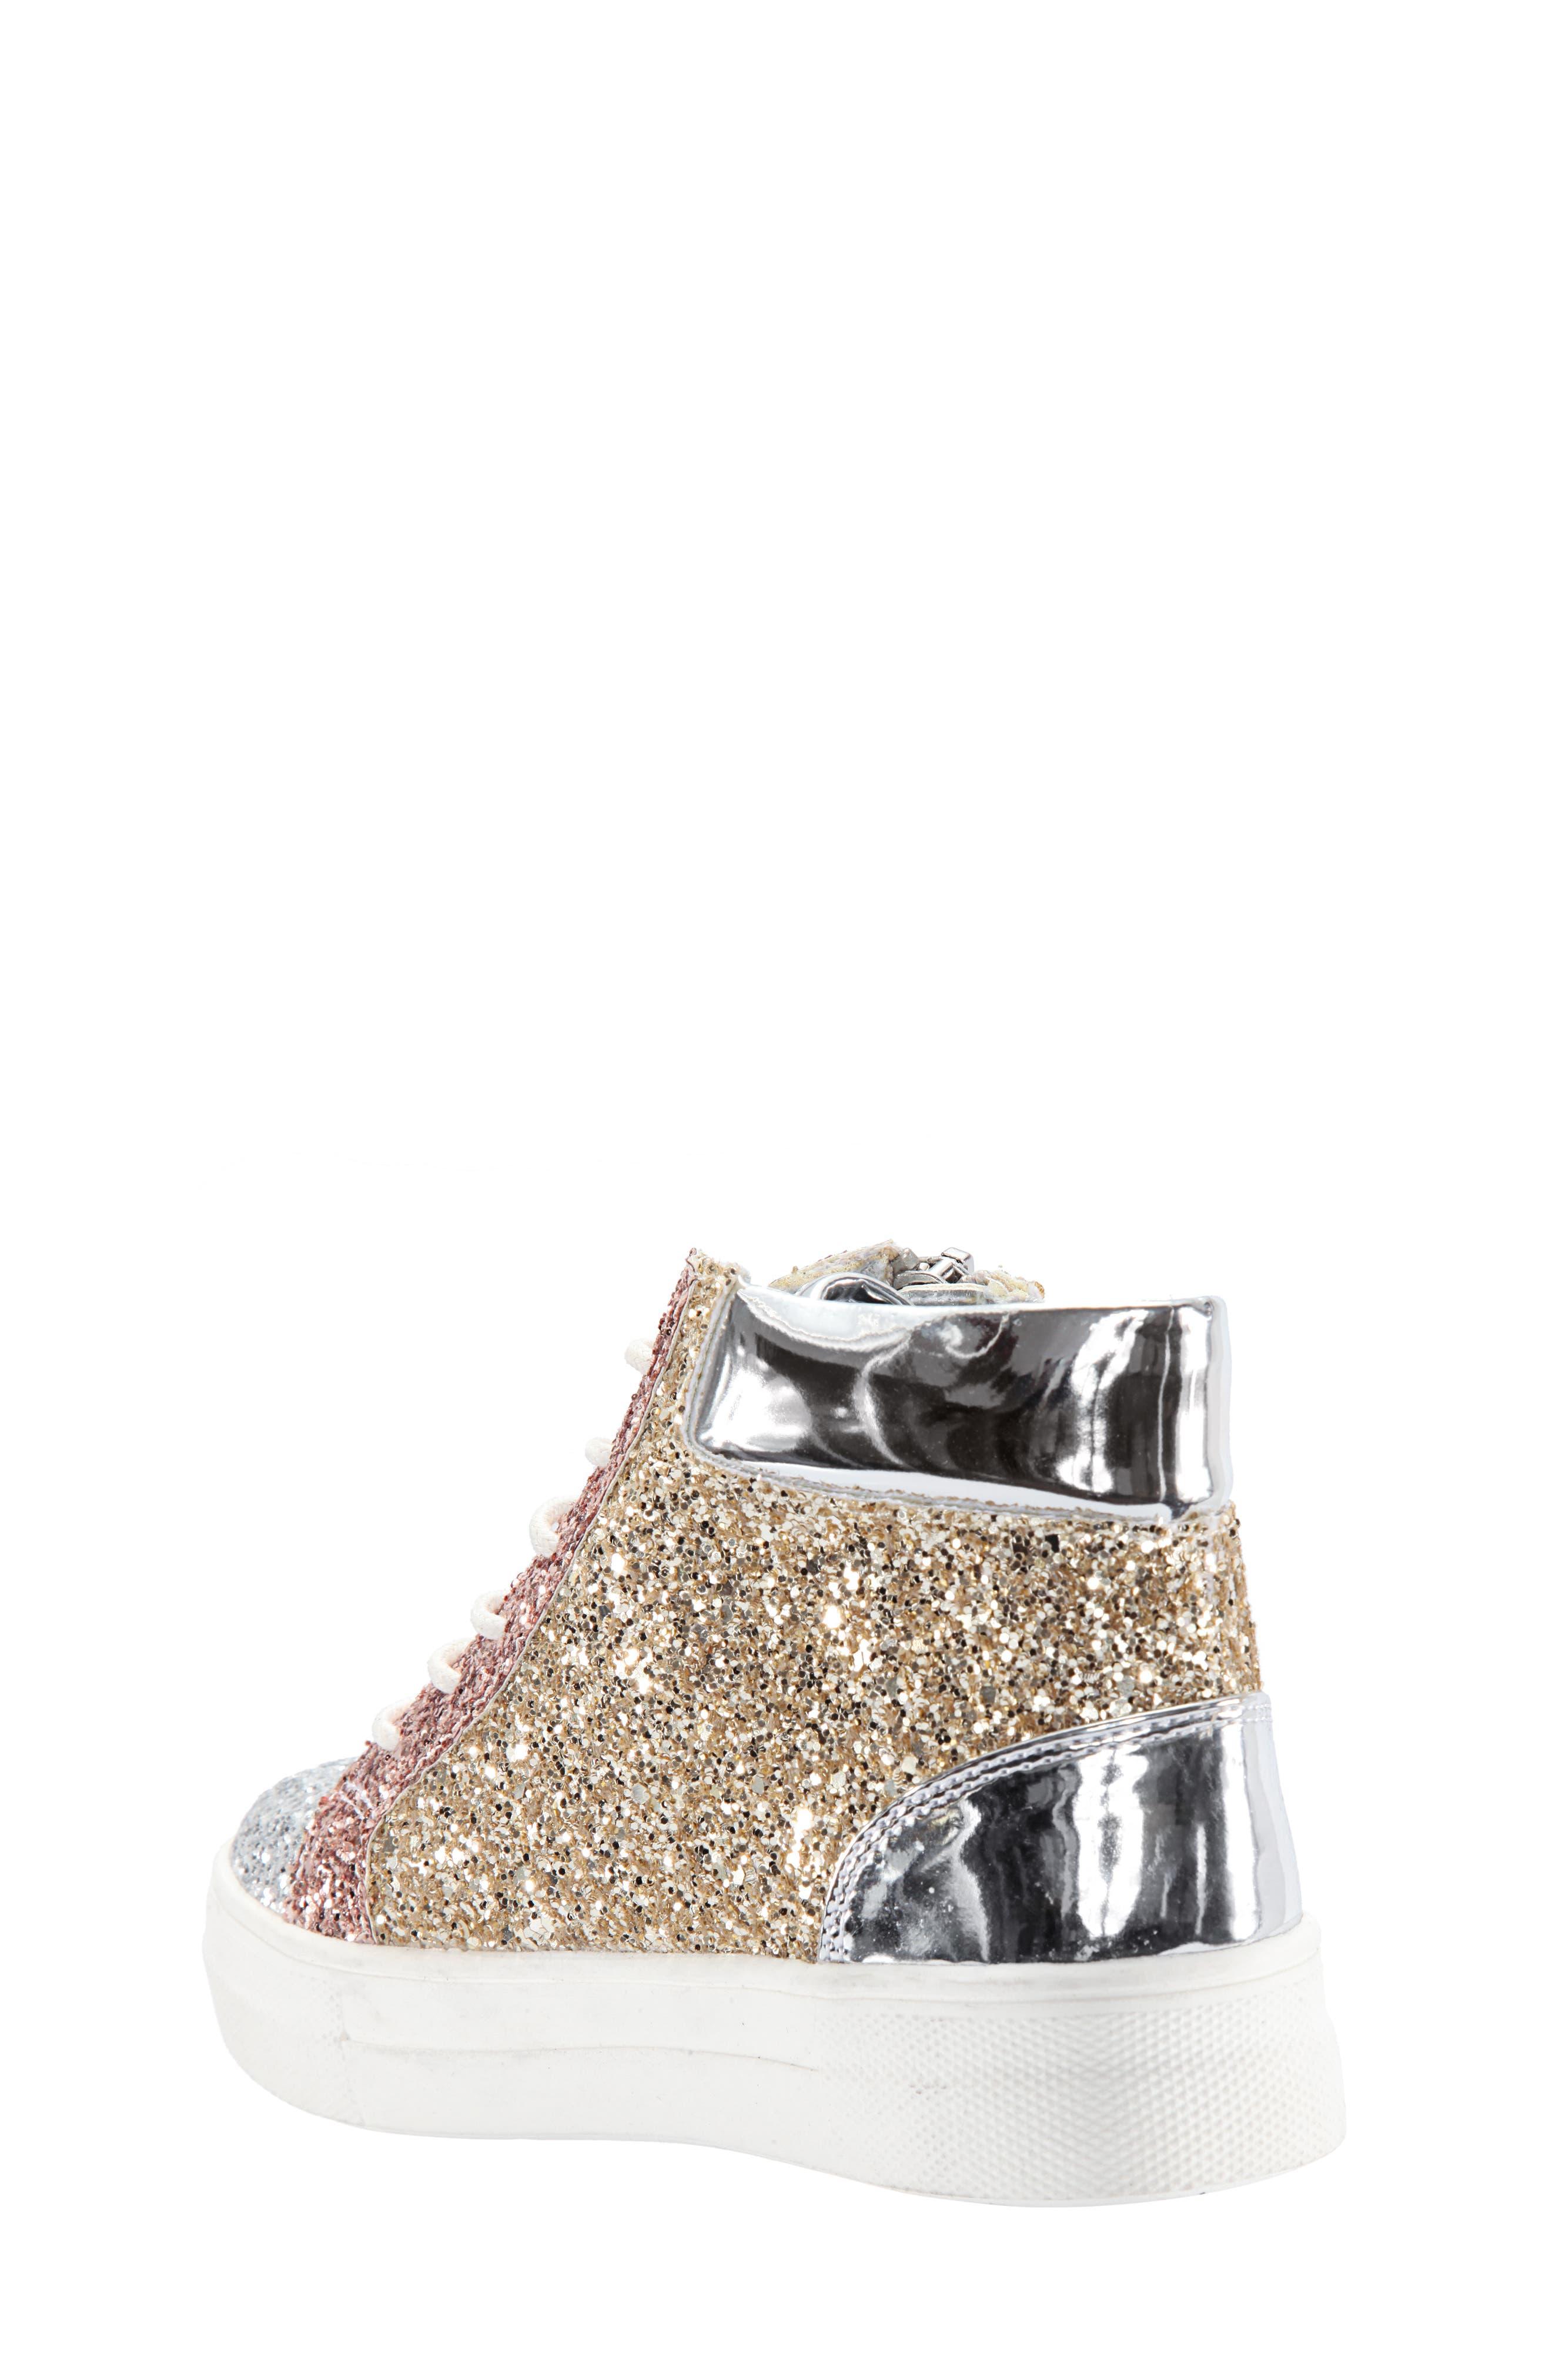 Hylda Glitter High Top Sneaker,                             Alternate thumbnail 2, color,                             SILVER MULTI GLITTER/ PATENT